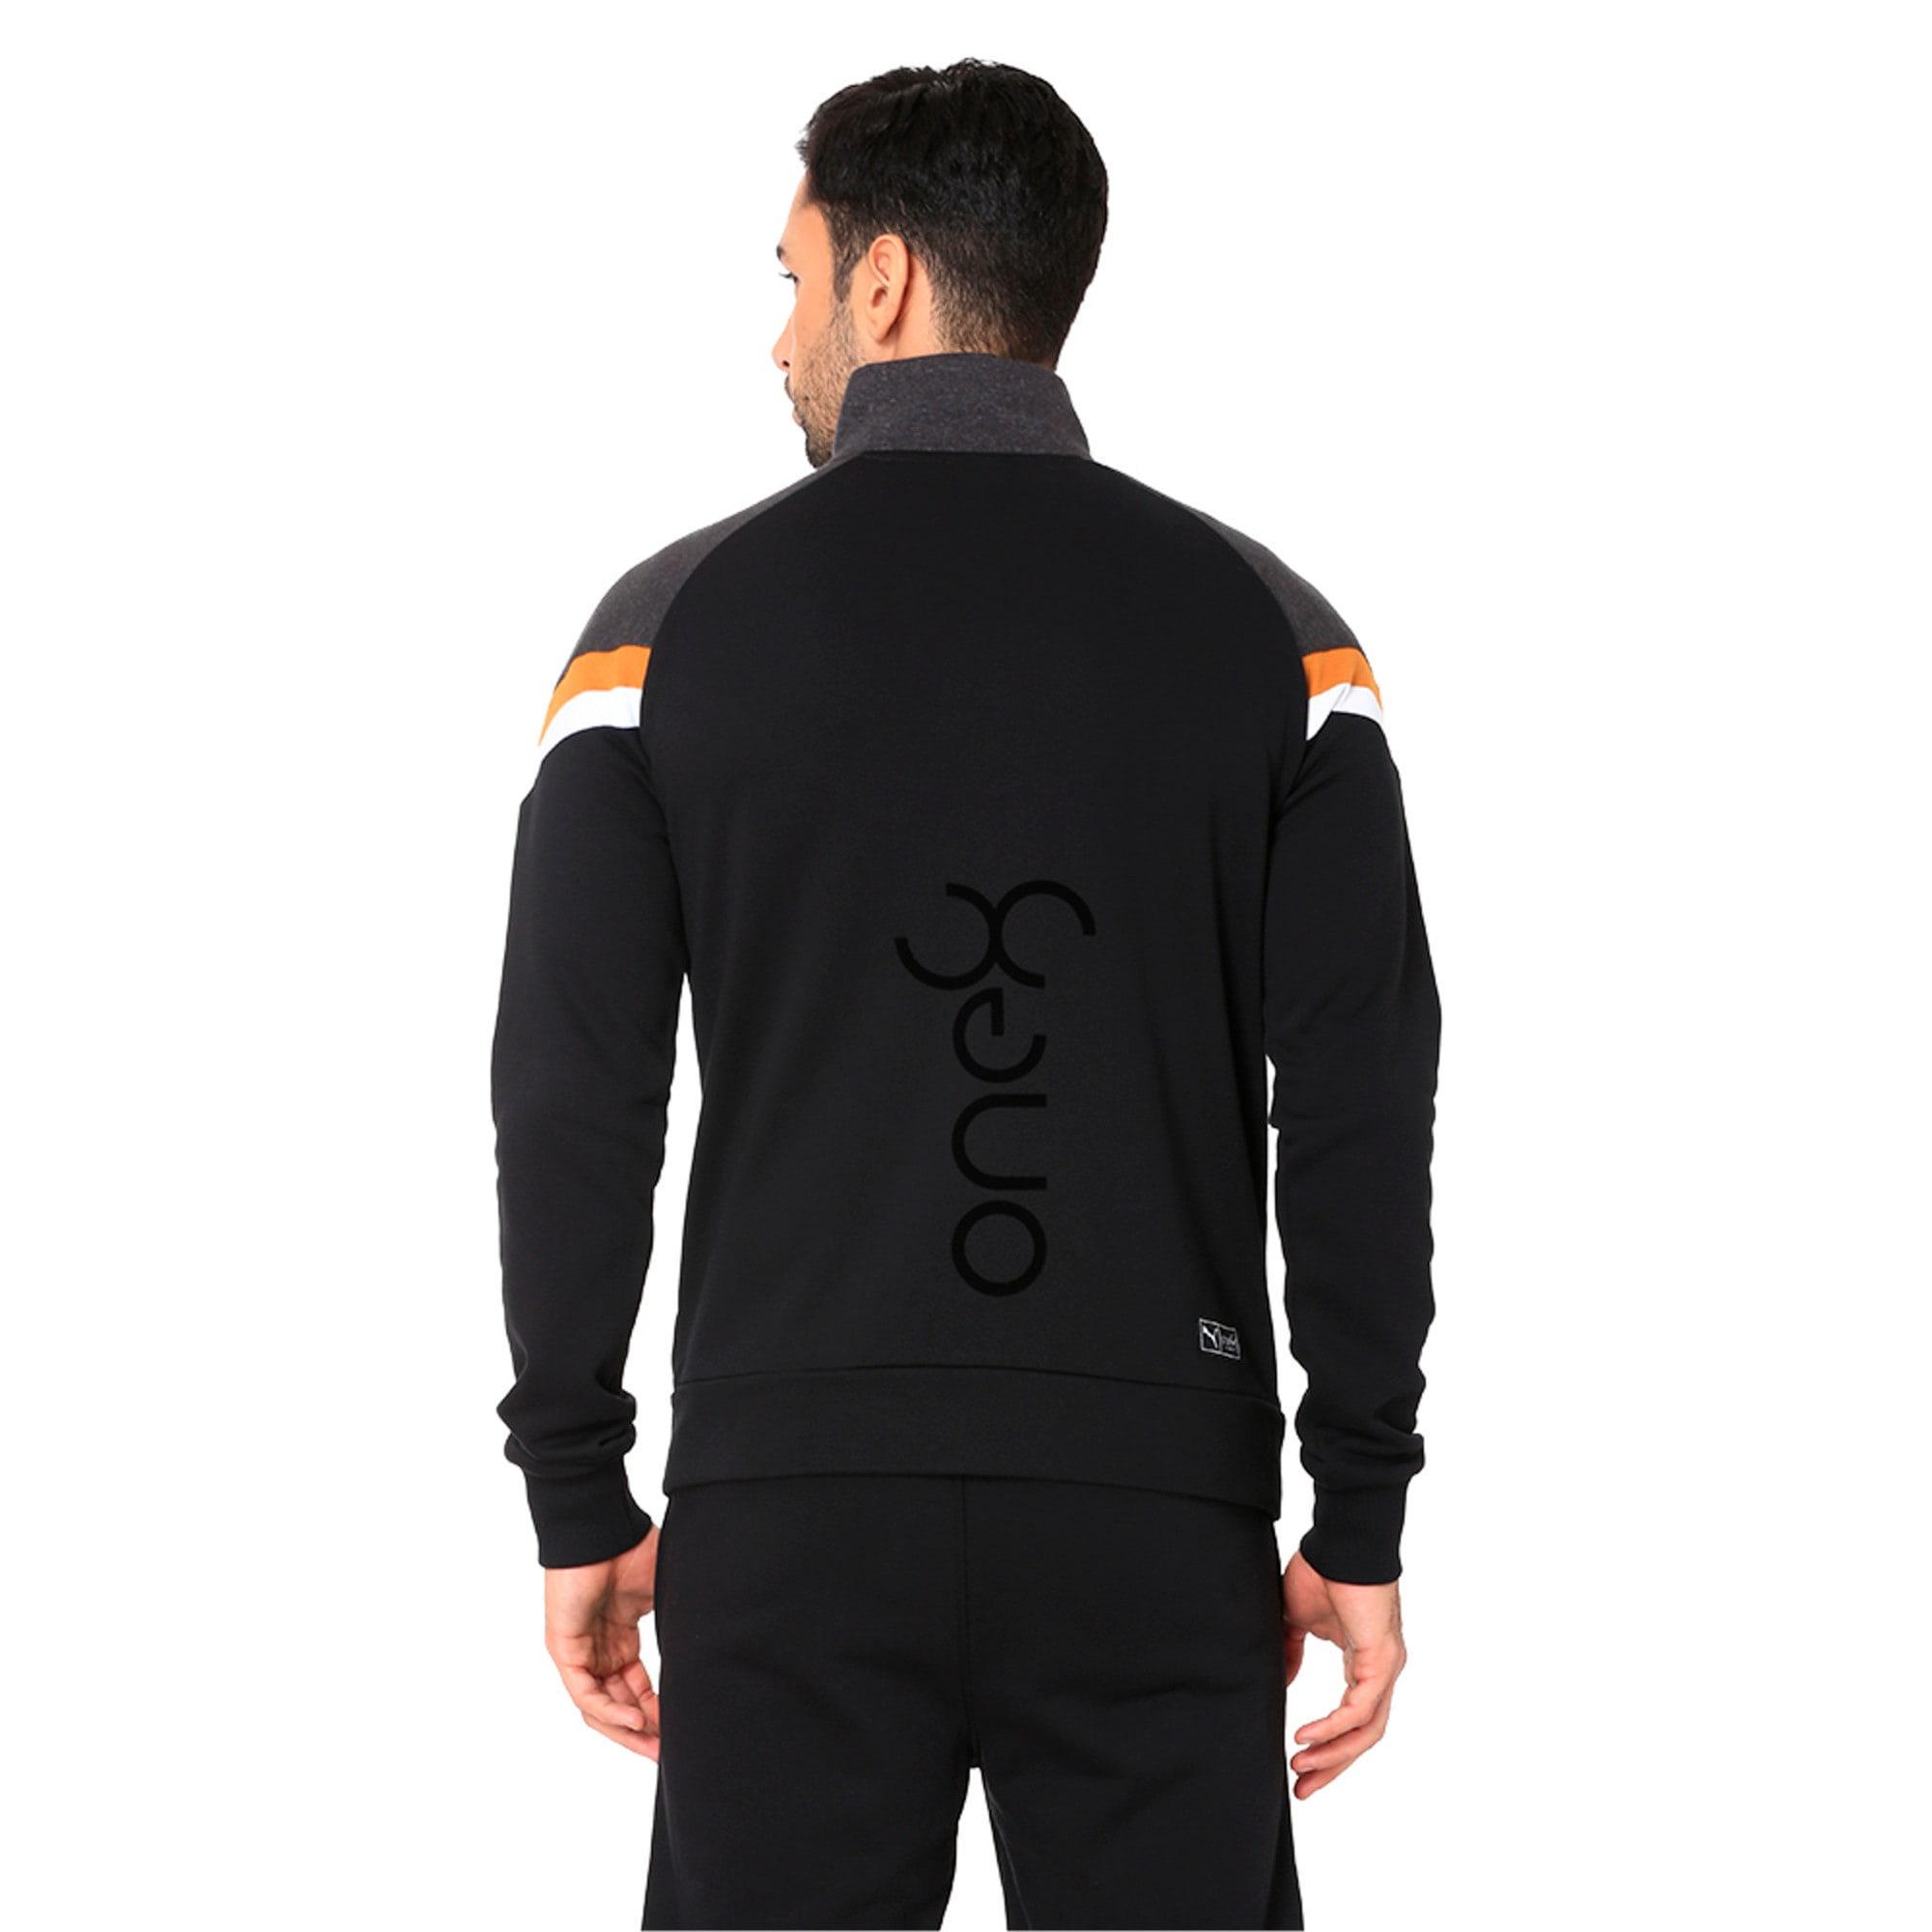 Thumbnail 2 of One8 VK Men's Jacket, Puma Black, medium-IND